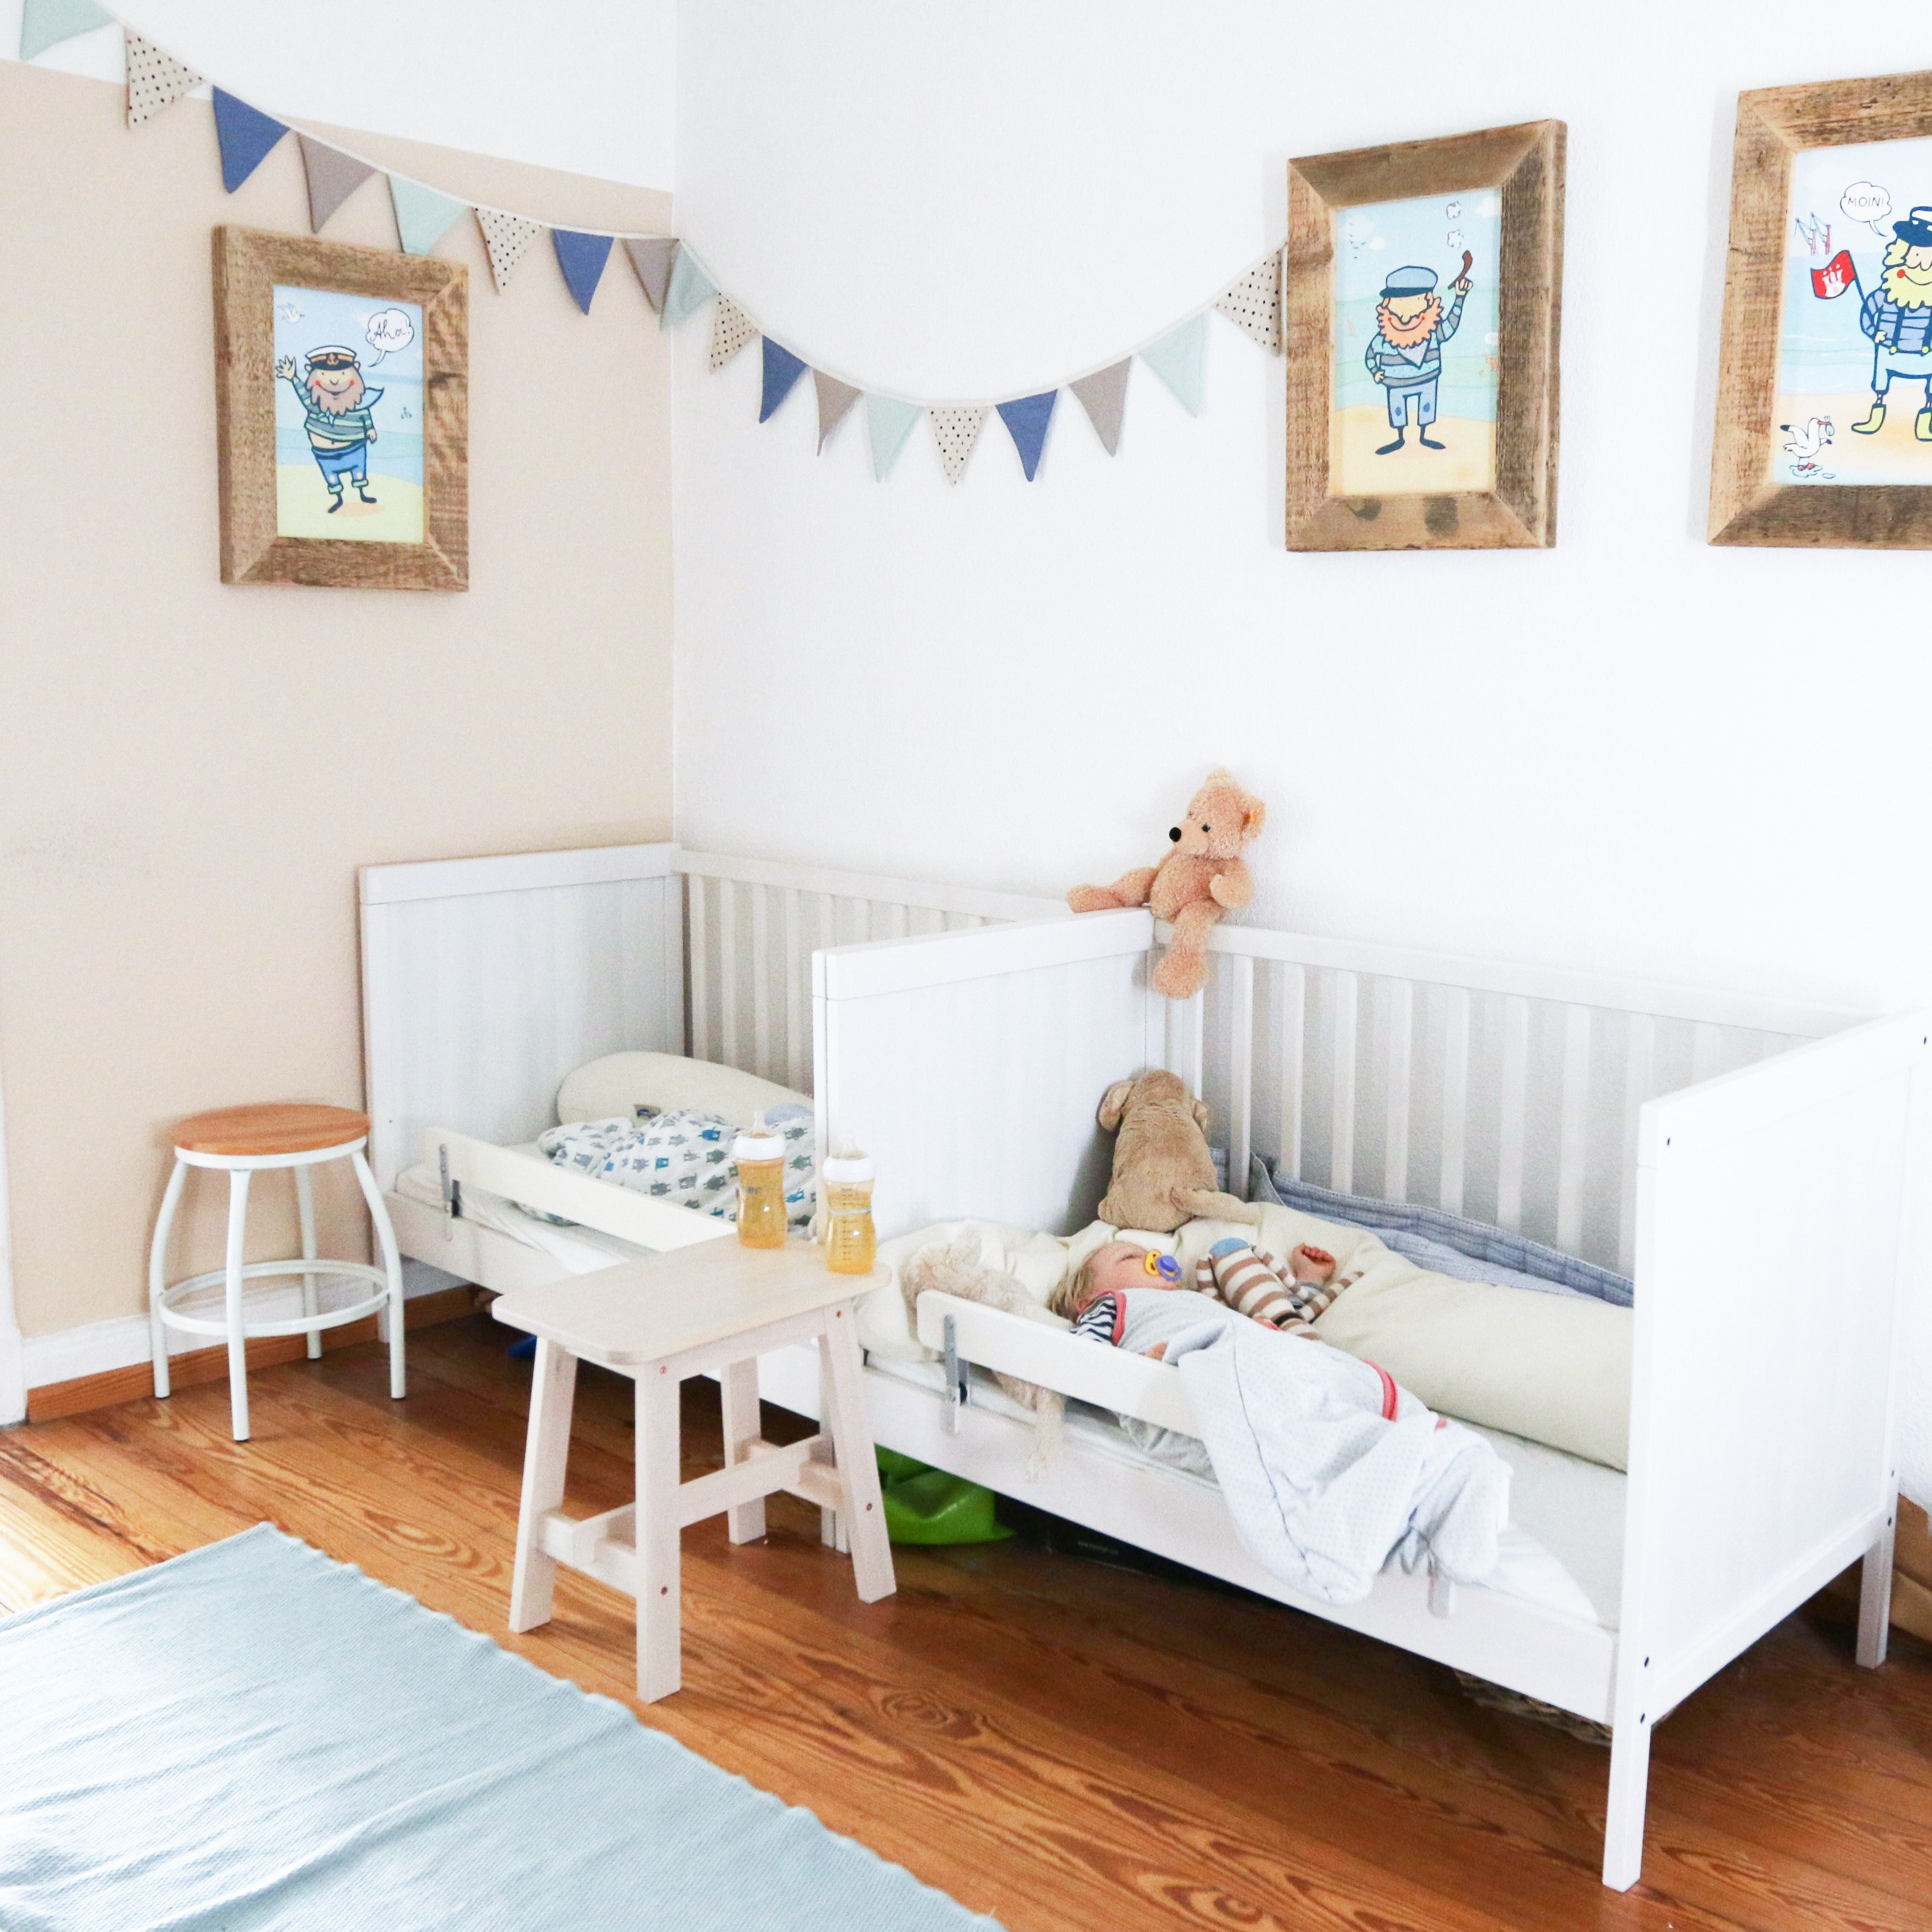 kinderzimmer betten zwillingsbetten zwillingszimmer interior kinderzimmer in 2018. Black Bedroom Furniture Sets. Home Design Ideas